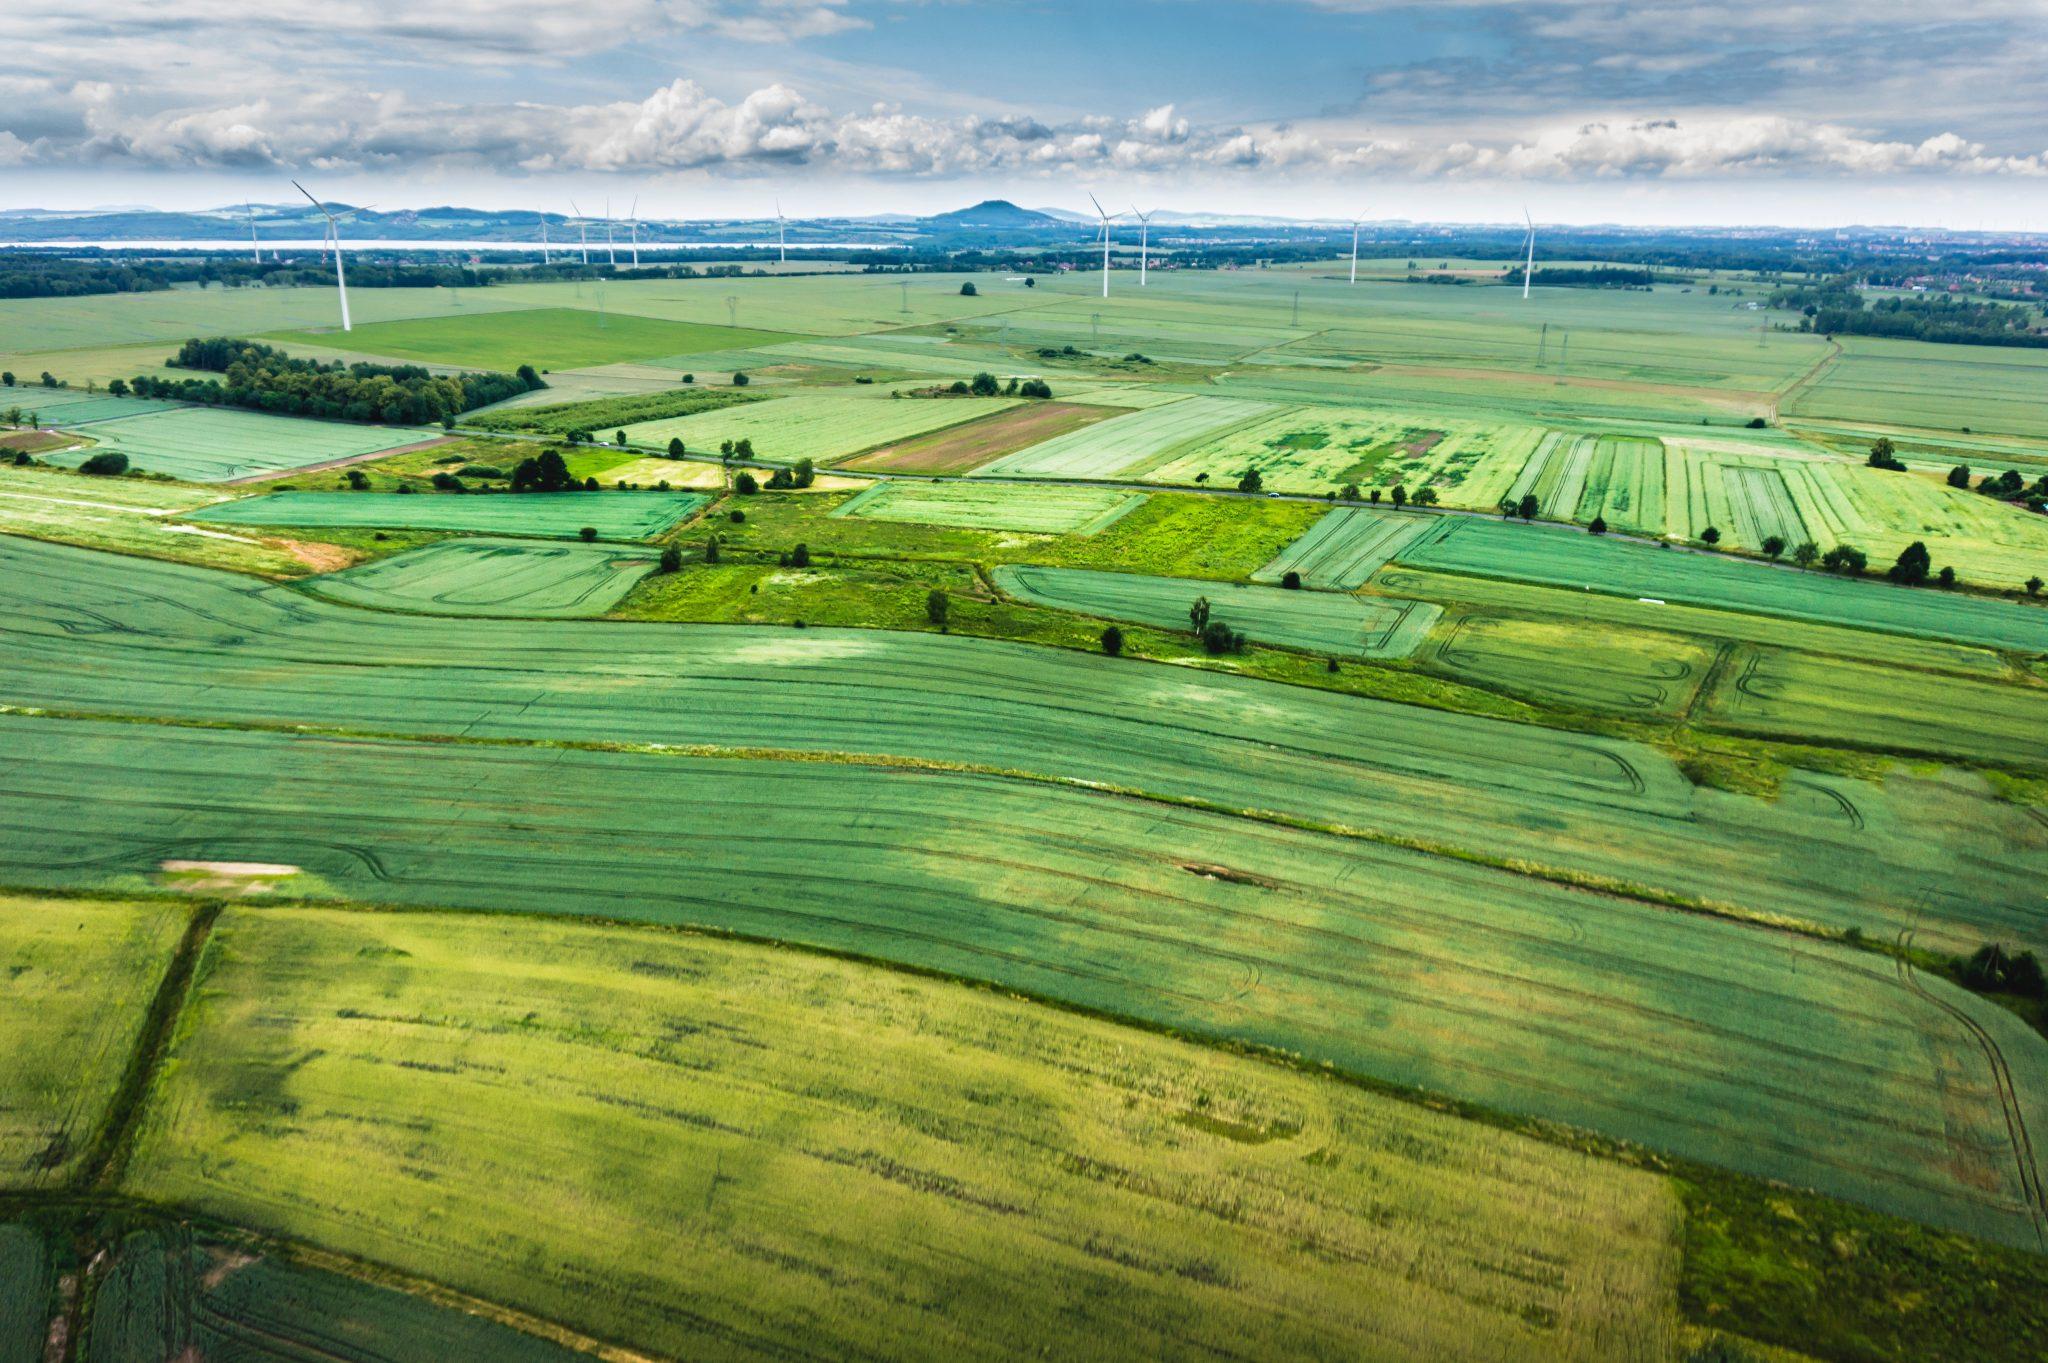 Greener Fields Together